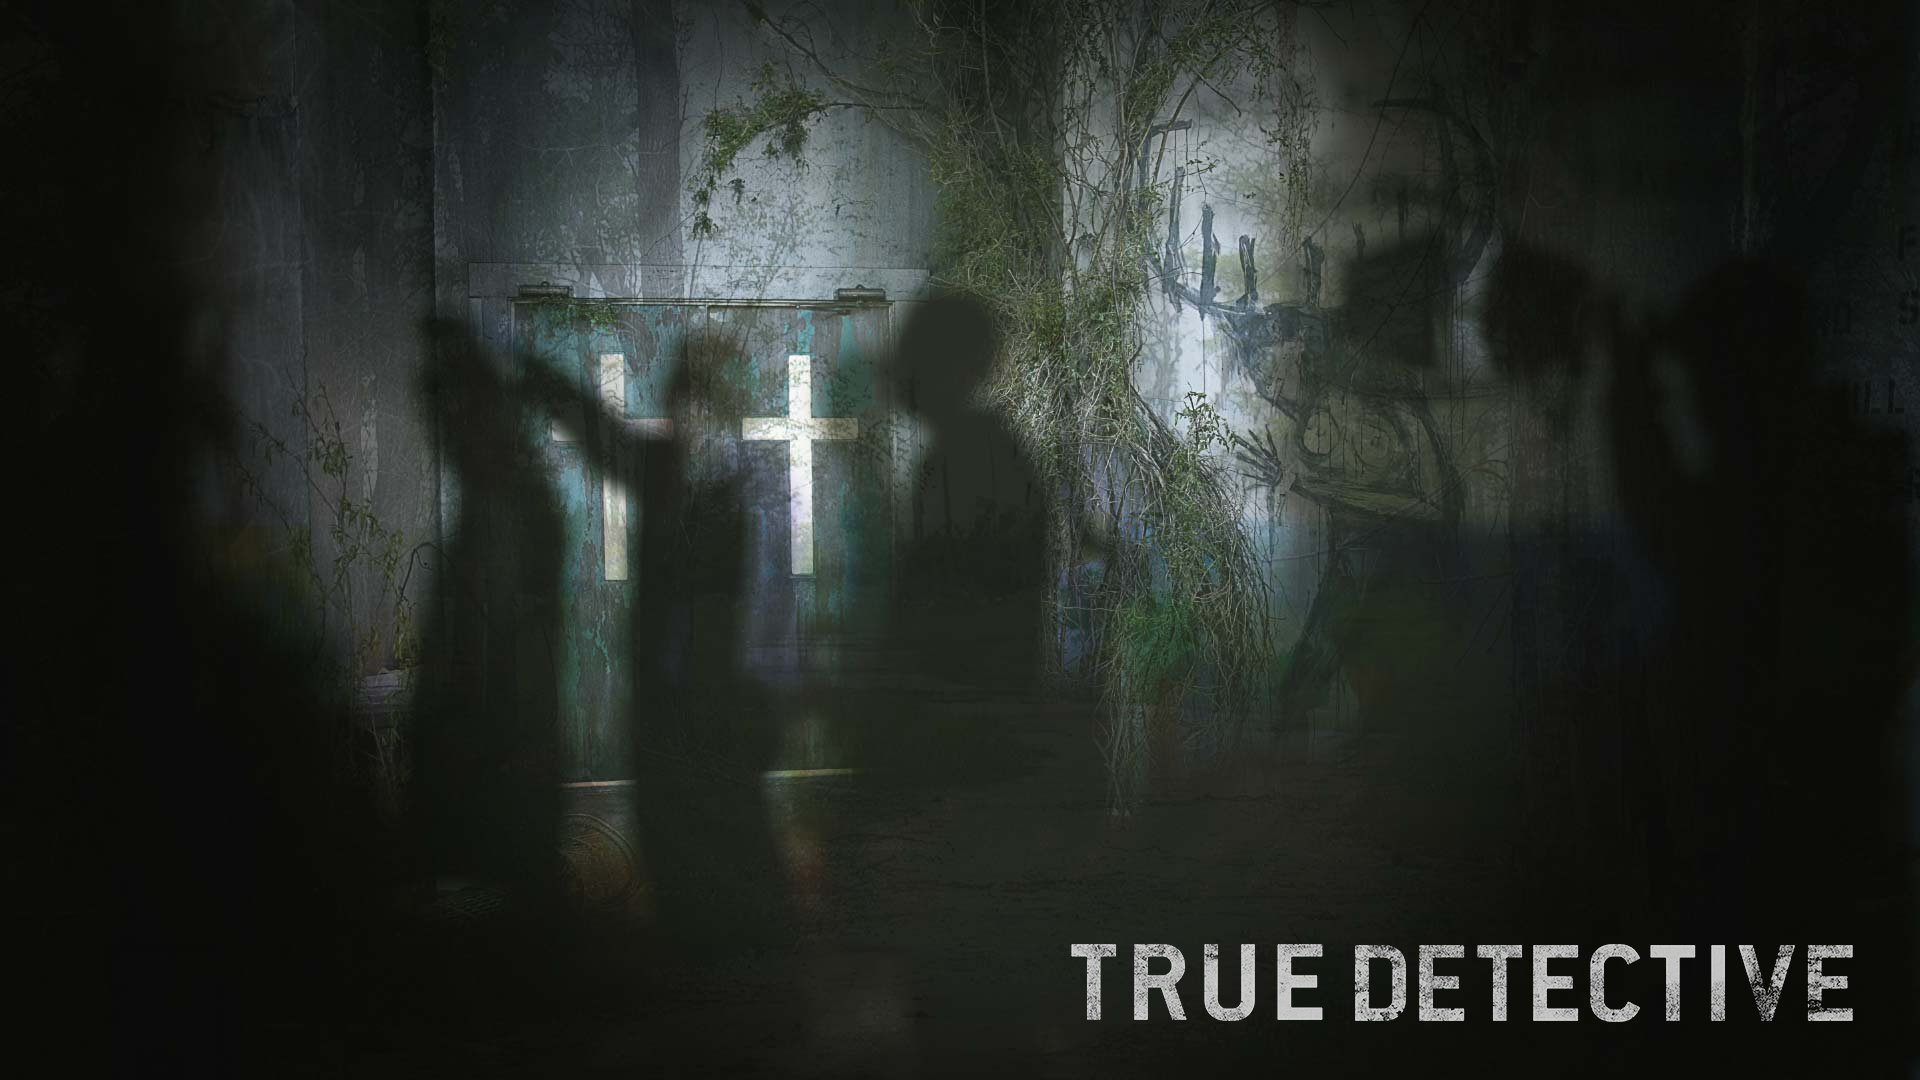 True Detective Wallpaper Iphone True Detective Hd Wallpaper Background Image 1920x1080